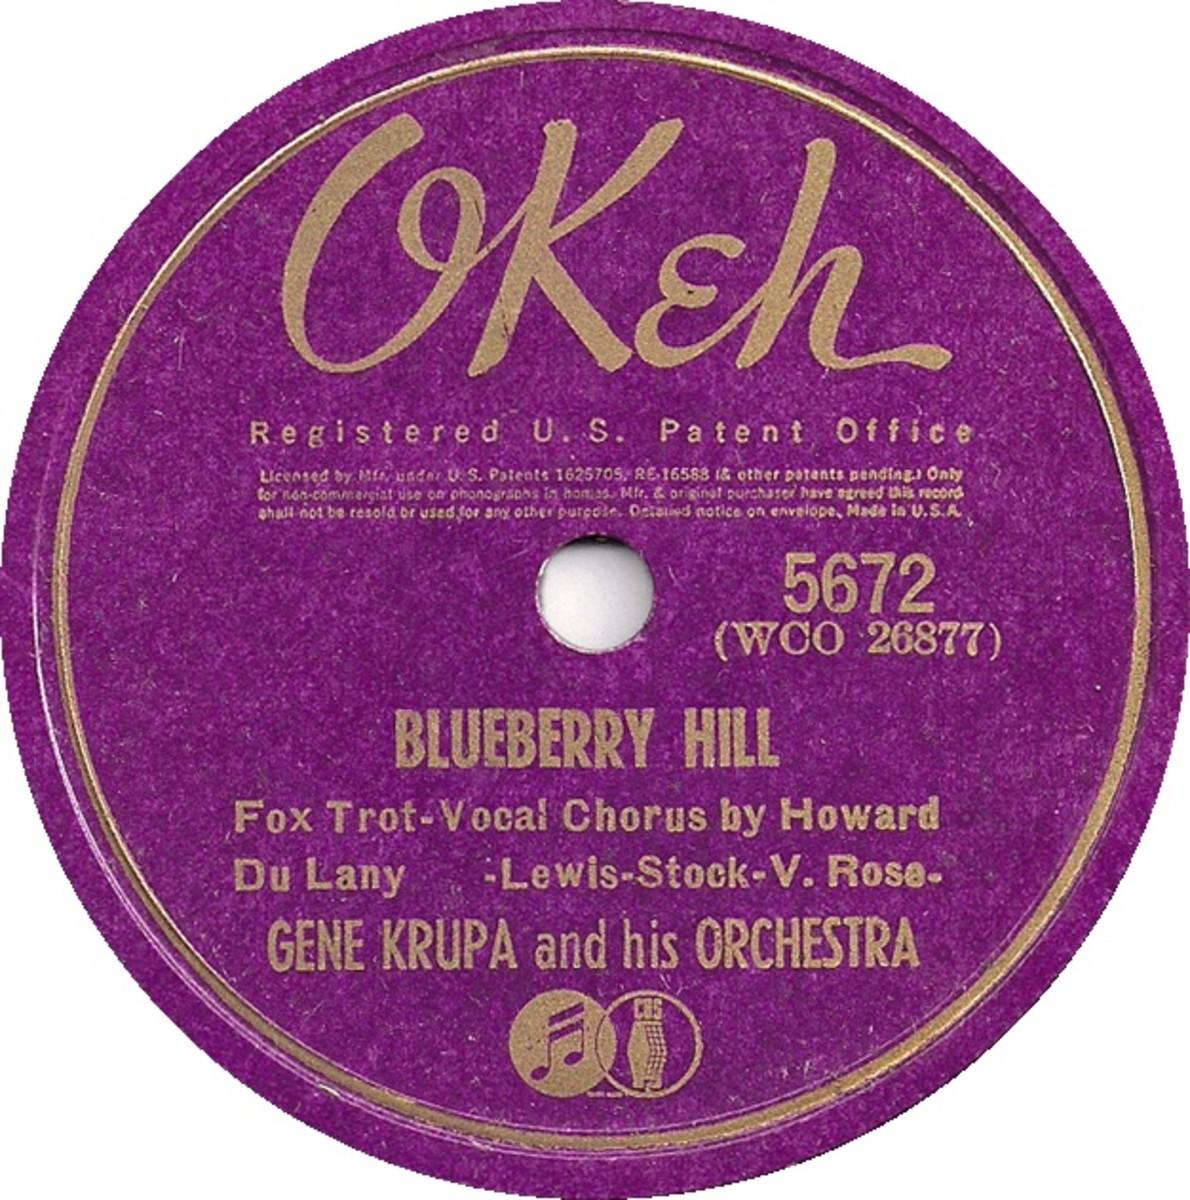 Gene Krupa LP of Blueberry Hill